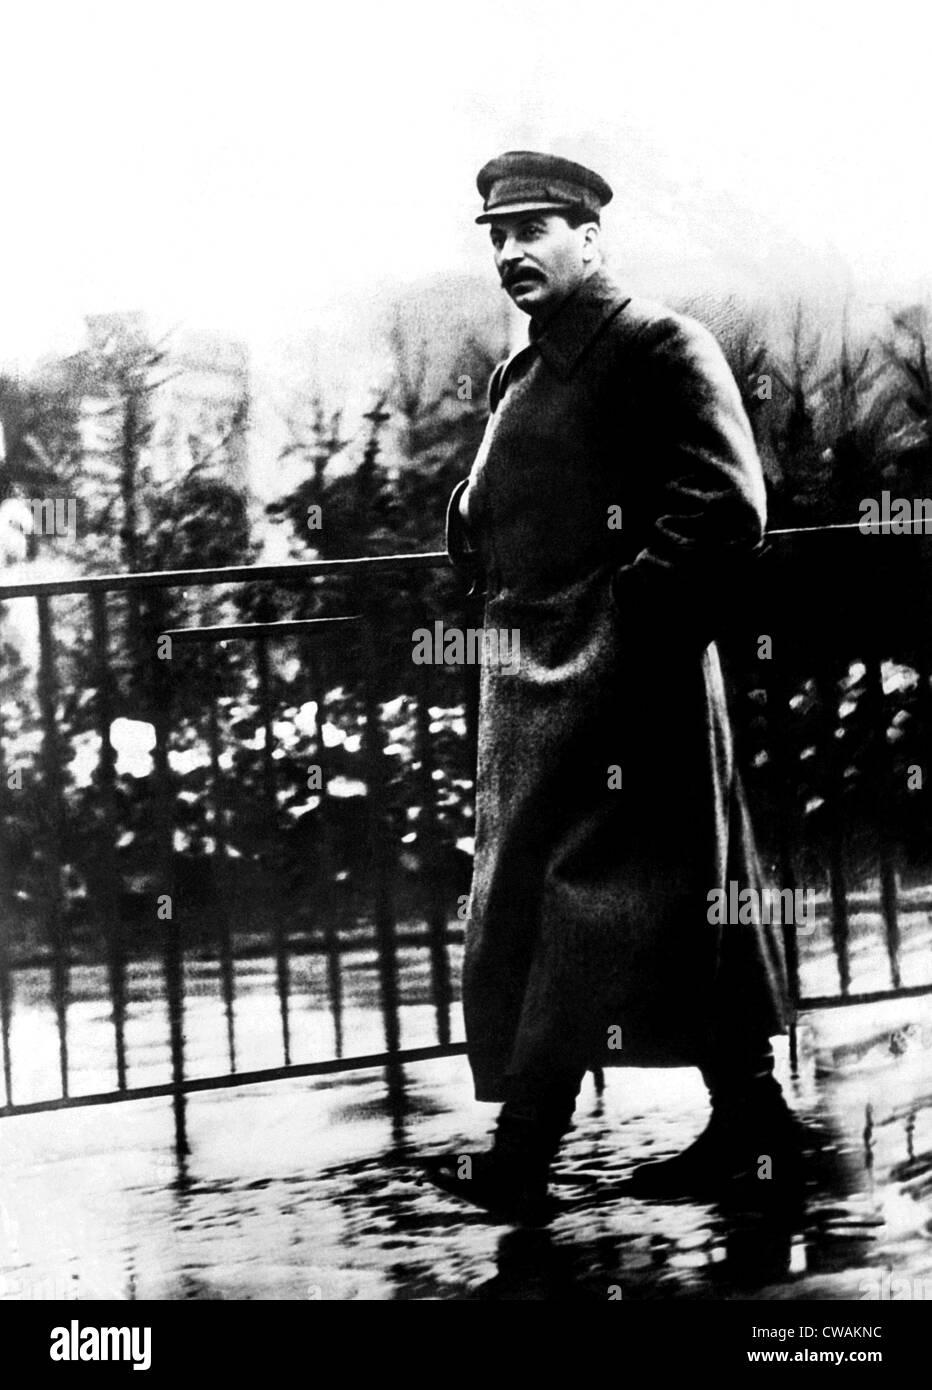 Josef Stalin se pasea por la Plaza Roja, Moscú, Rusia, ca. 1932. Cortesía: CSU Archives/Everett Collection. Imagen De Stock